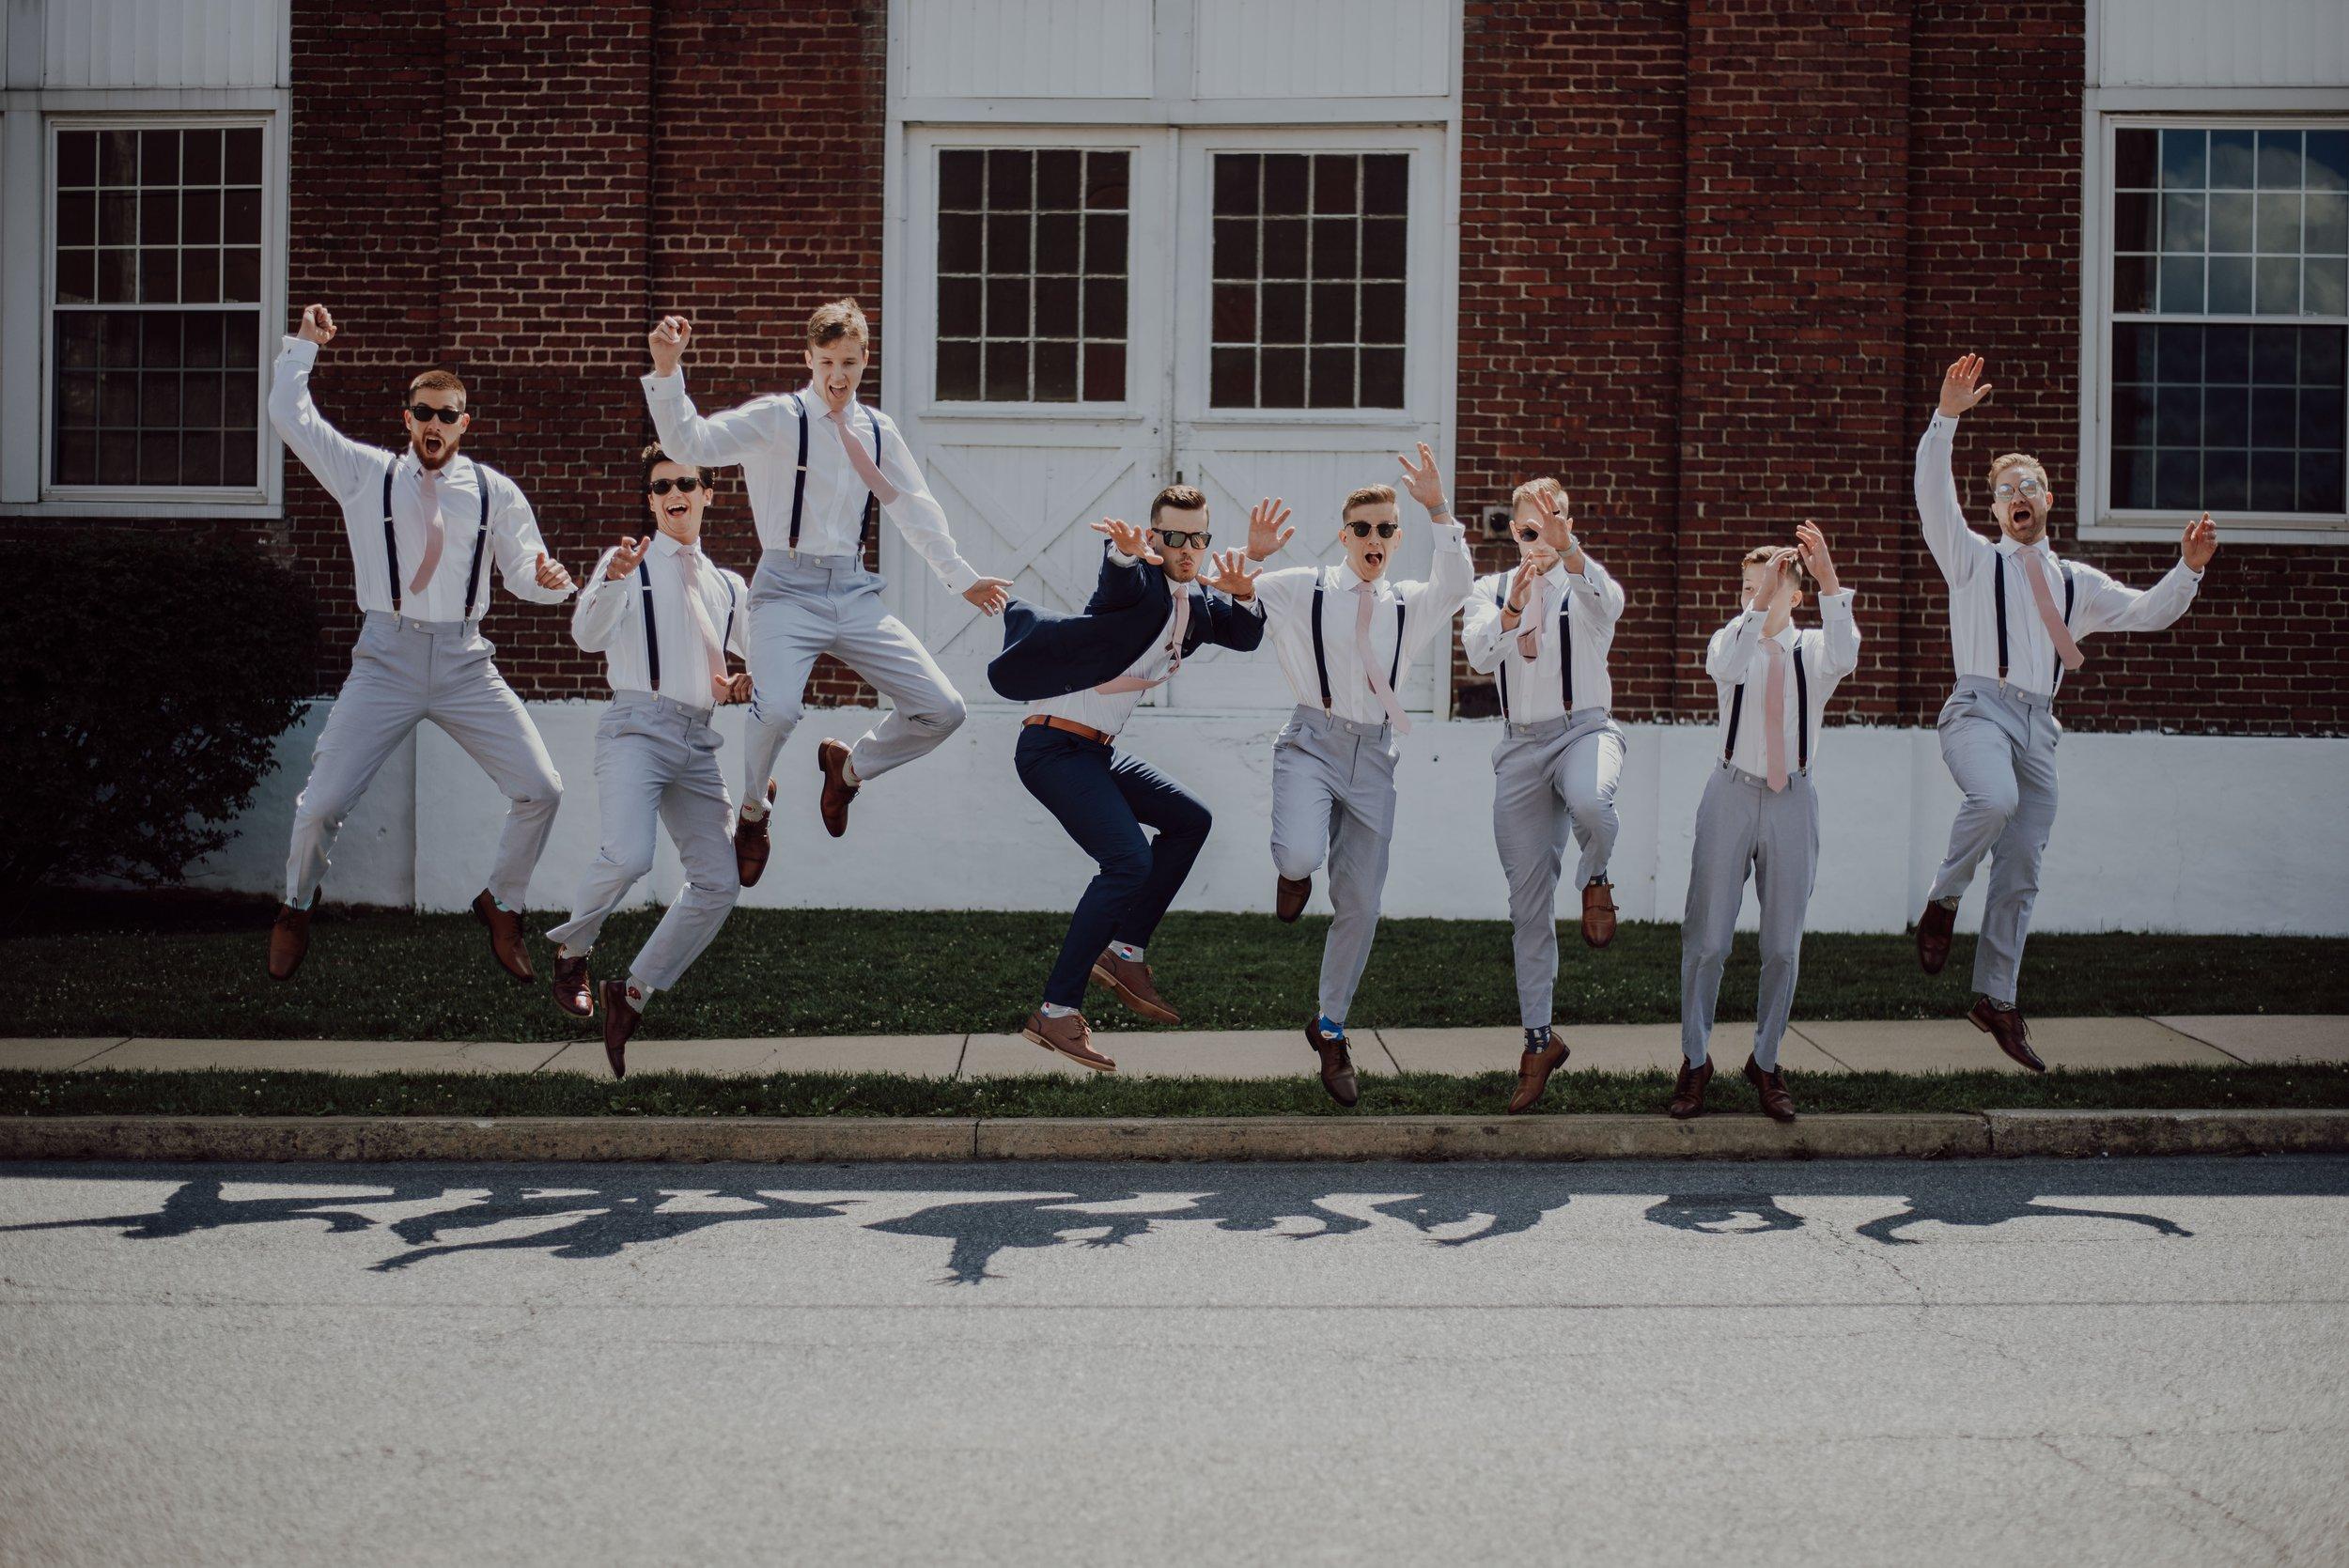 groomsmen-kapiti-bridal-party